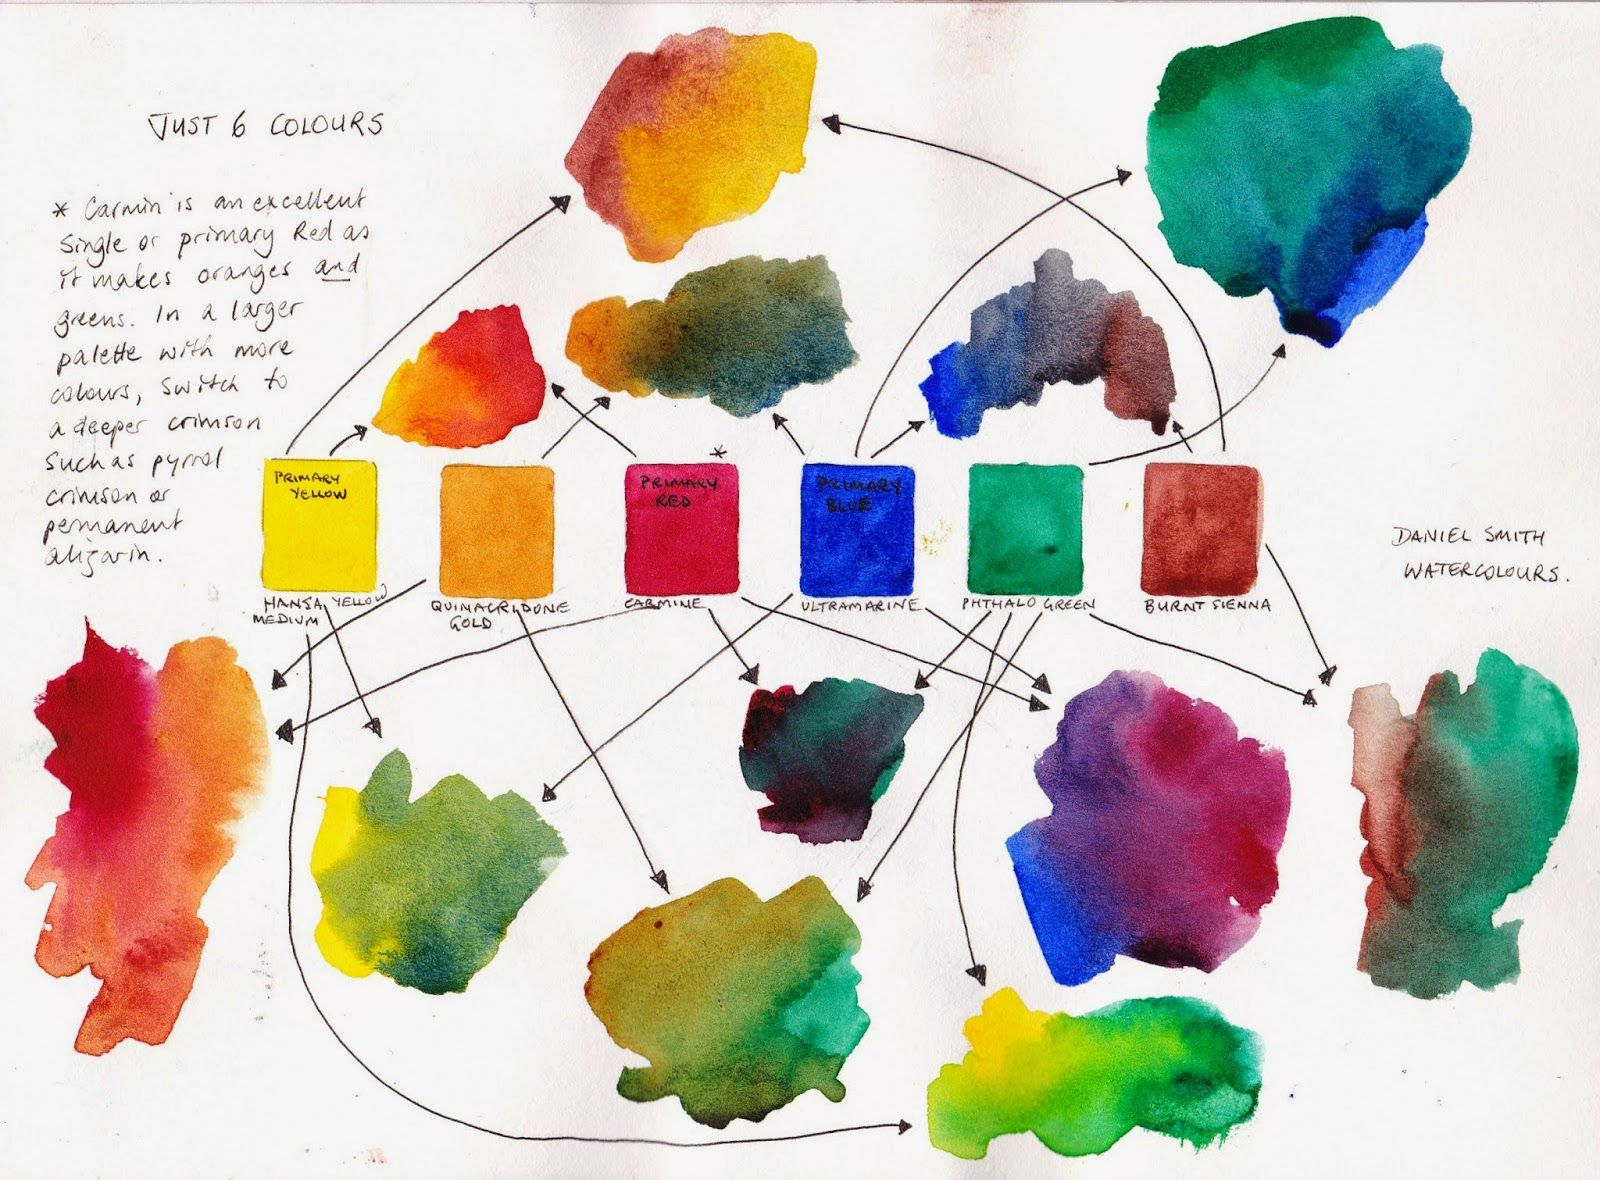 Just 6 Colours A Lovely Limited Palette Wasserfarben Kunst